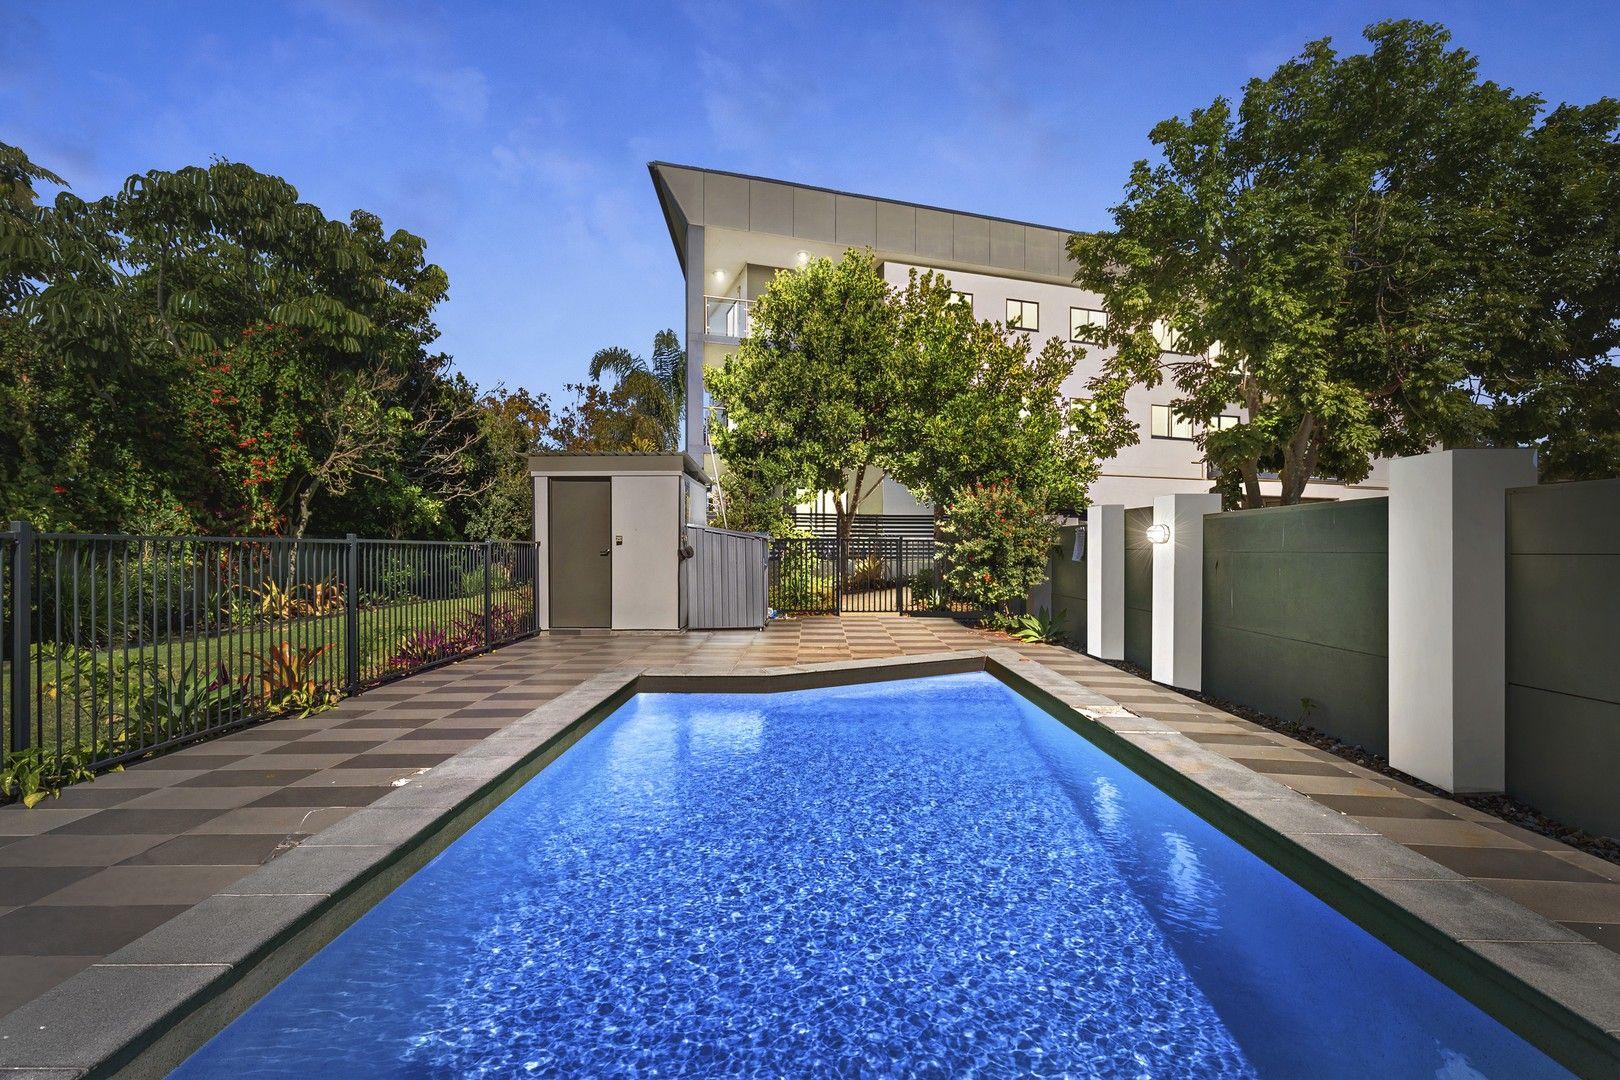 11/1 Cowen Street, Margate QLD 4019, Image 0